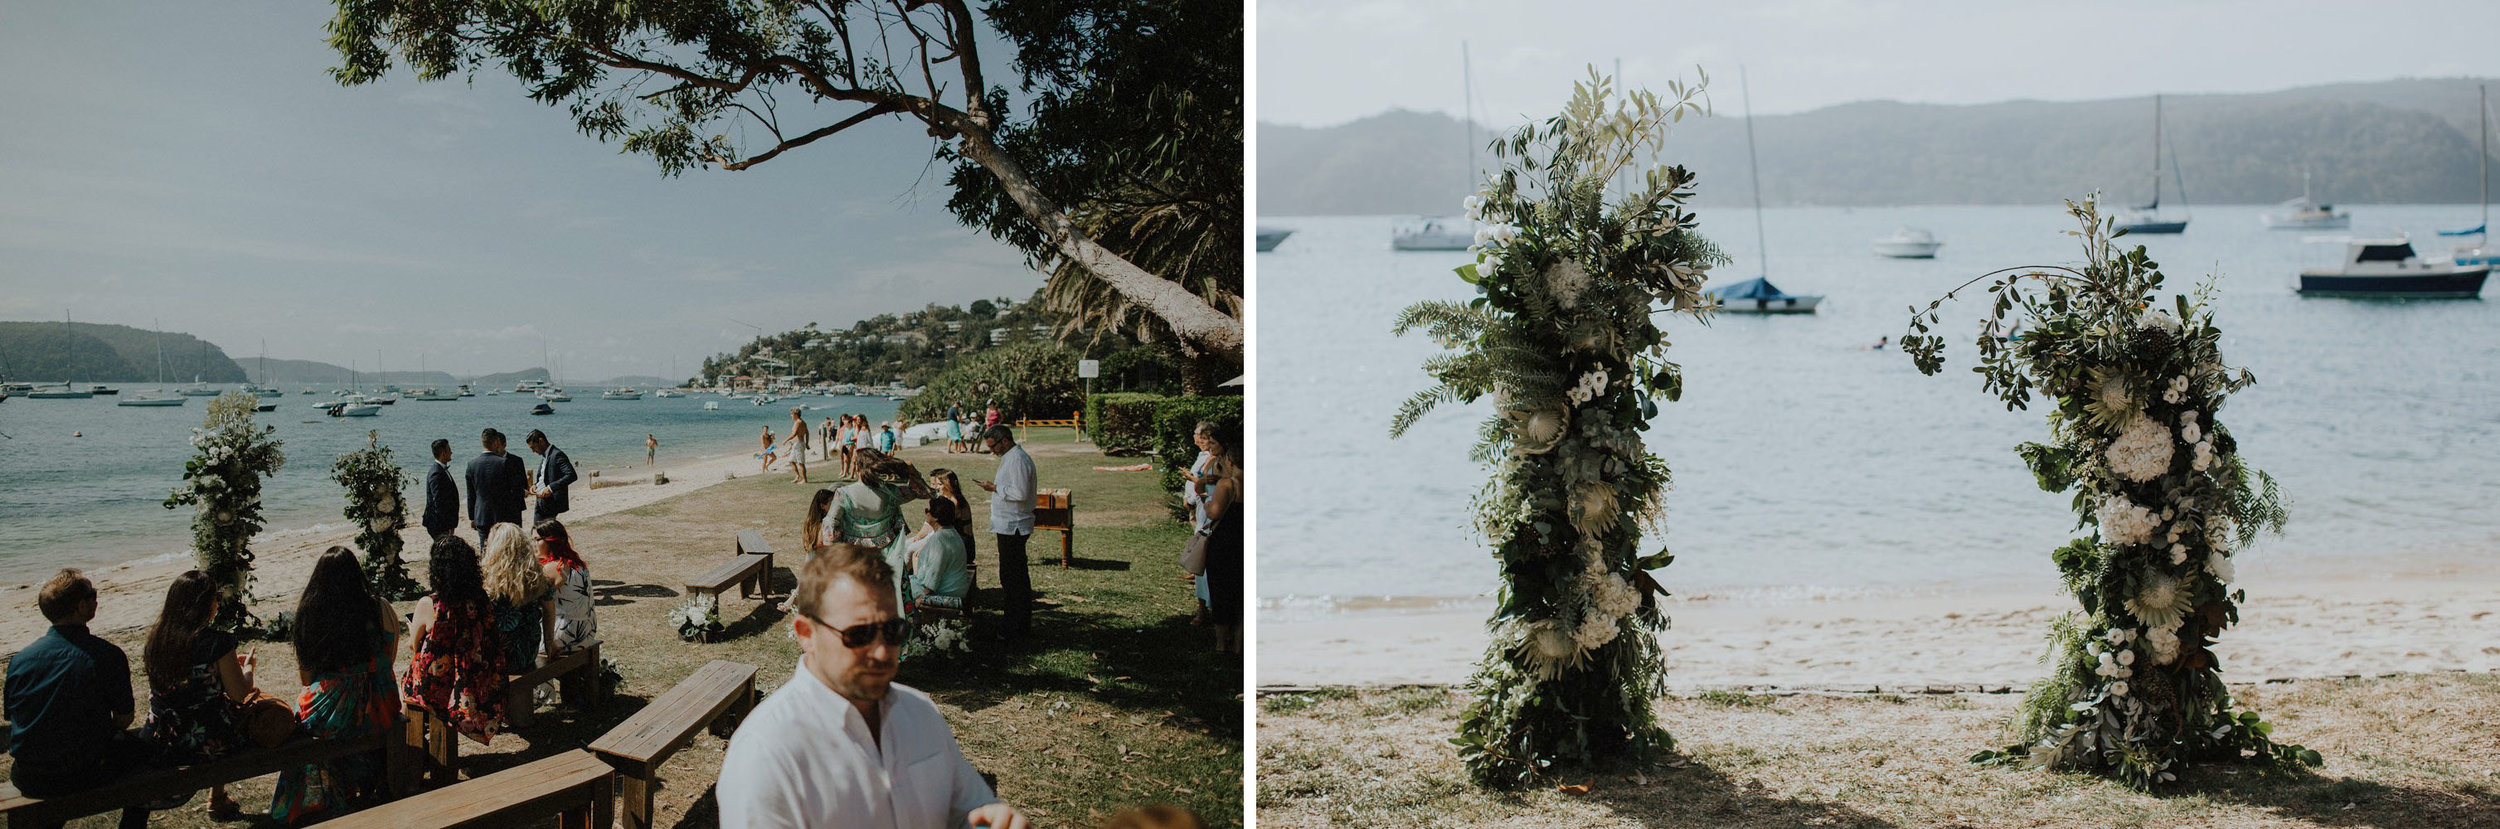 the-boat-house-palm-beach-wedding_037(8398)2.jpg